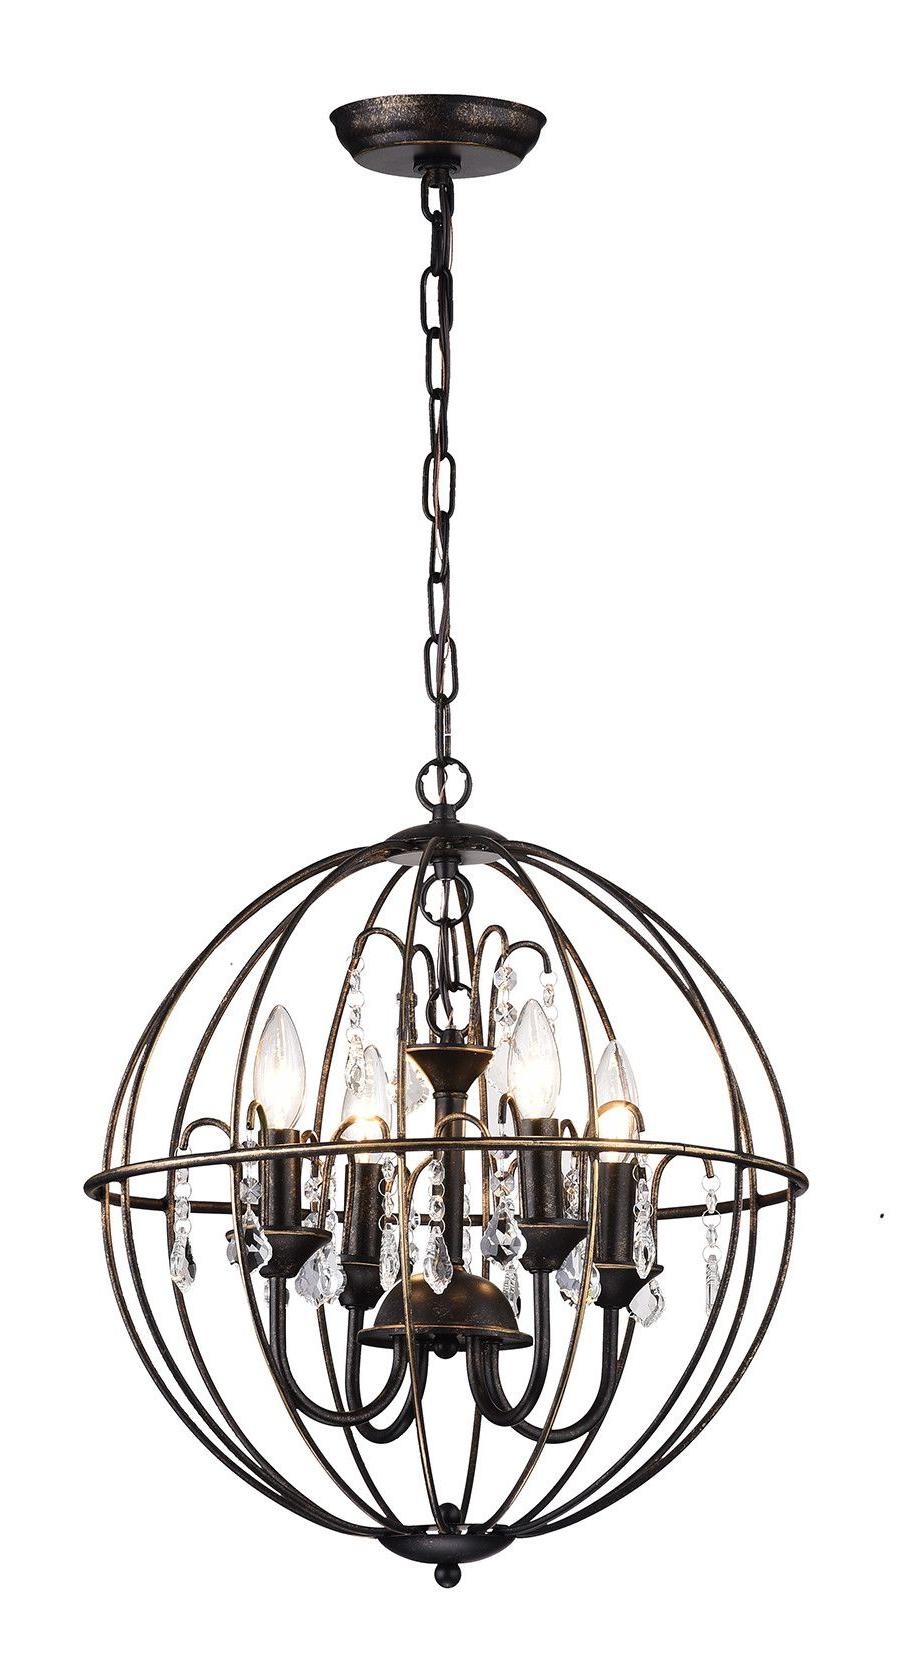 Chandelier Regarding Current Donna 6 Light Globe Chandeliers (Gallery 17 of 20)